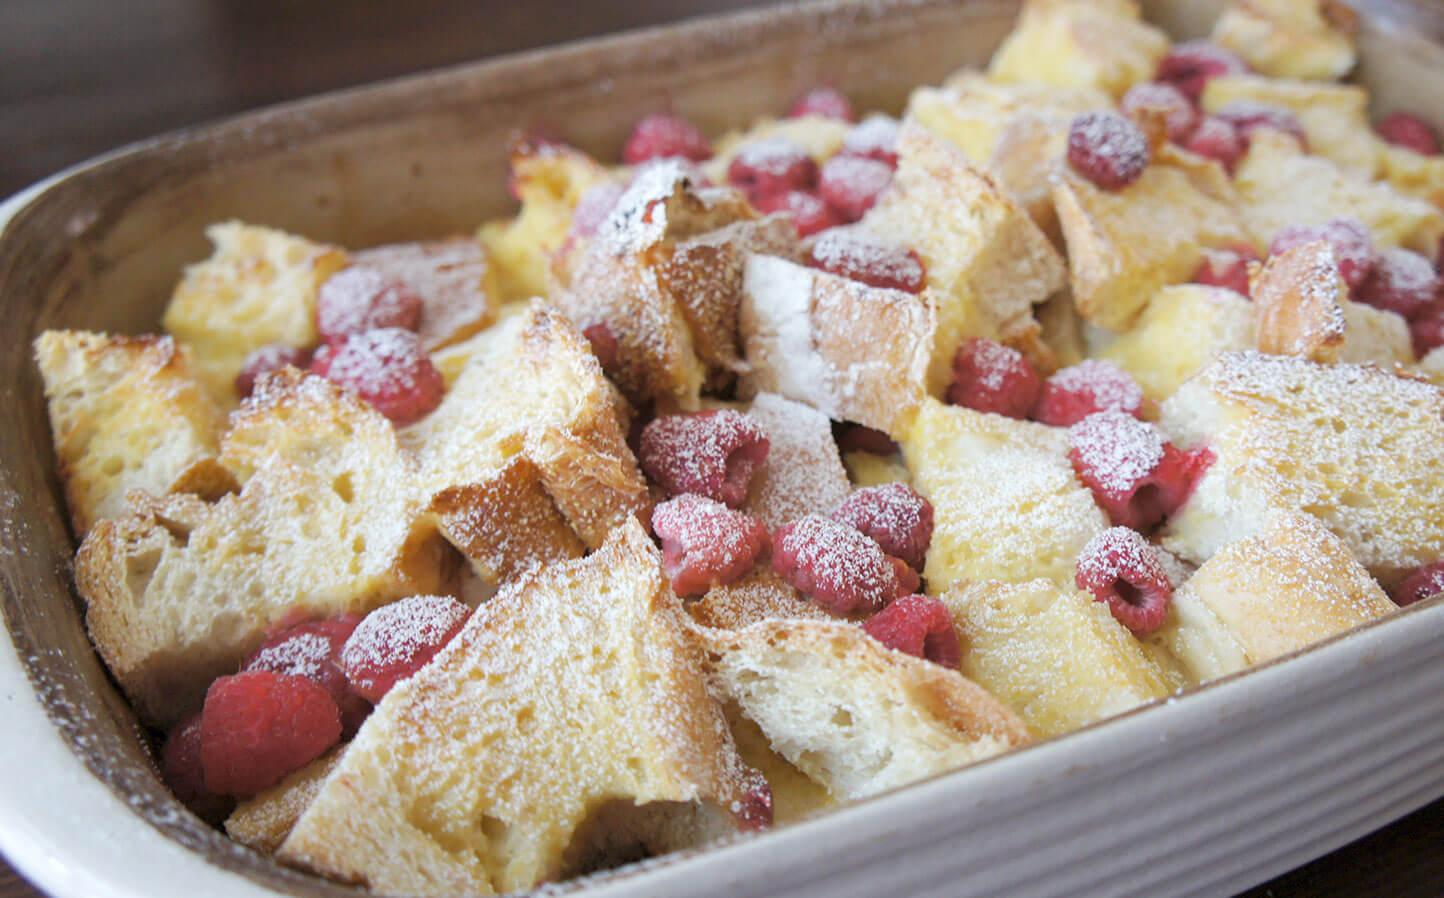 Raspberry French Toast Recipe from Raspberry Grower Wish Farms